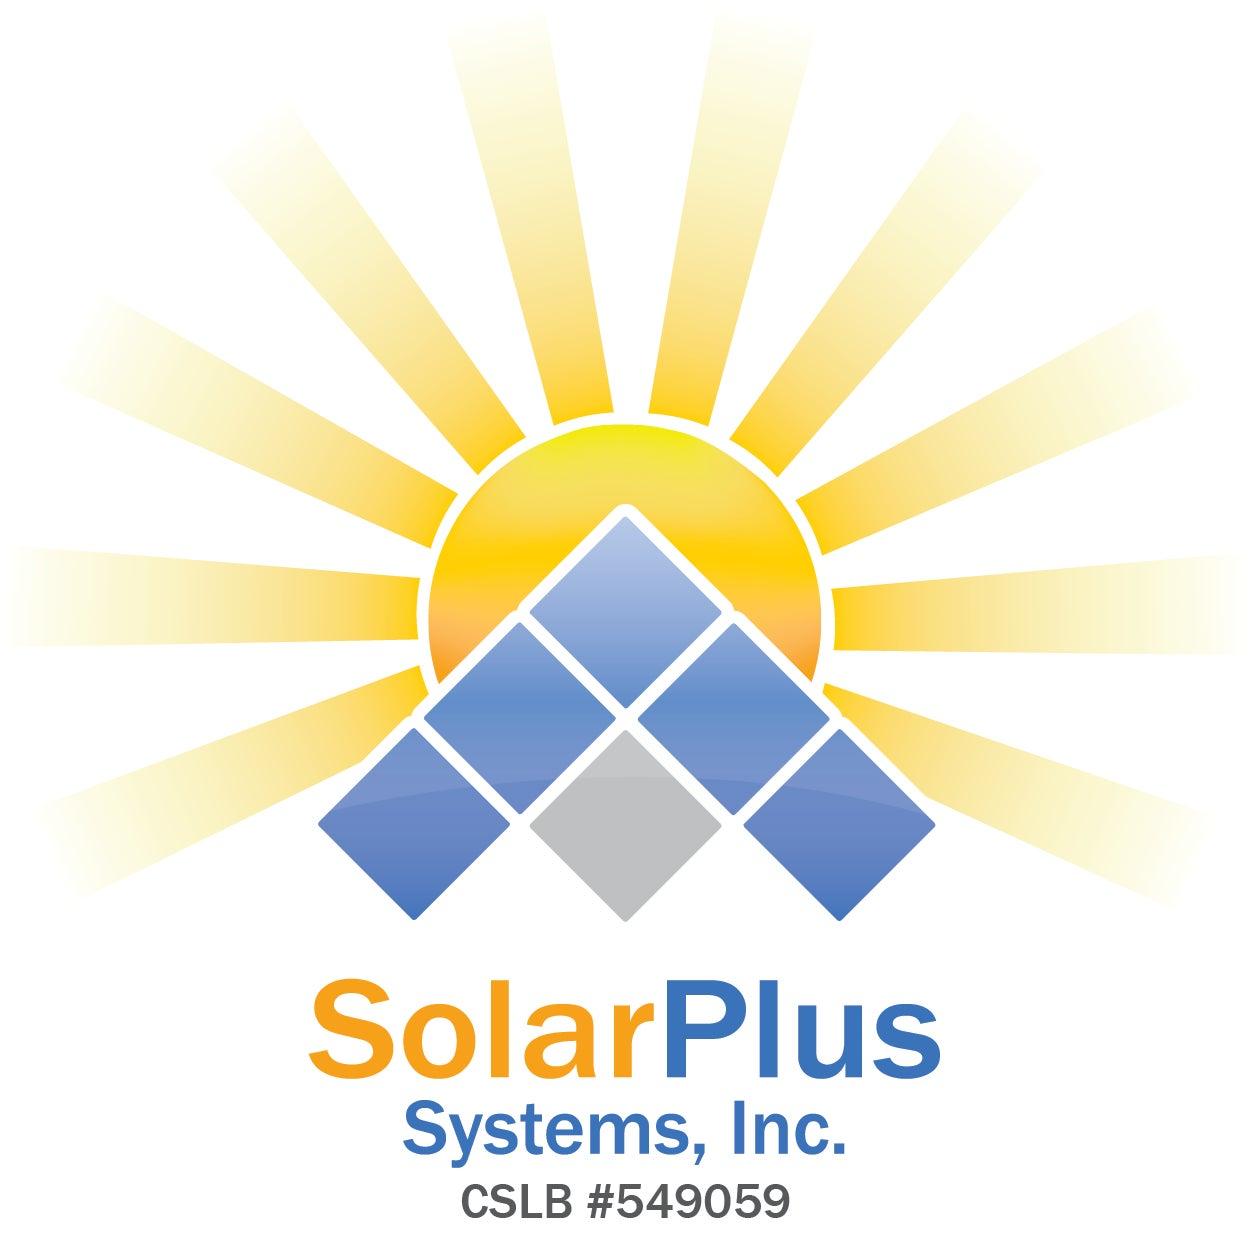 Are SolarEdge Technologies solar panels the best solar panels to buy